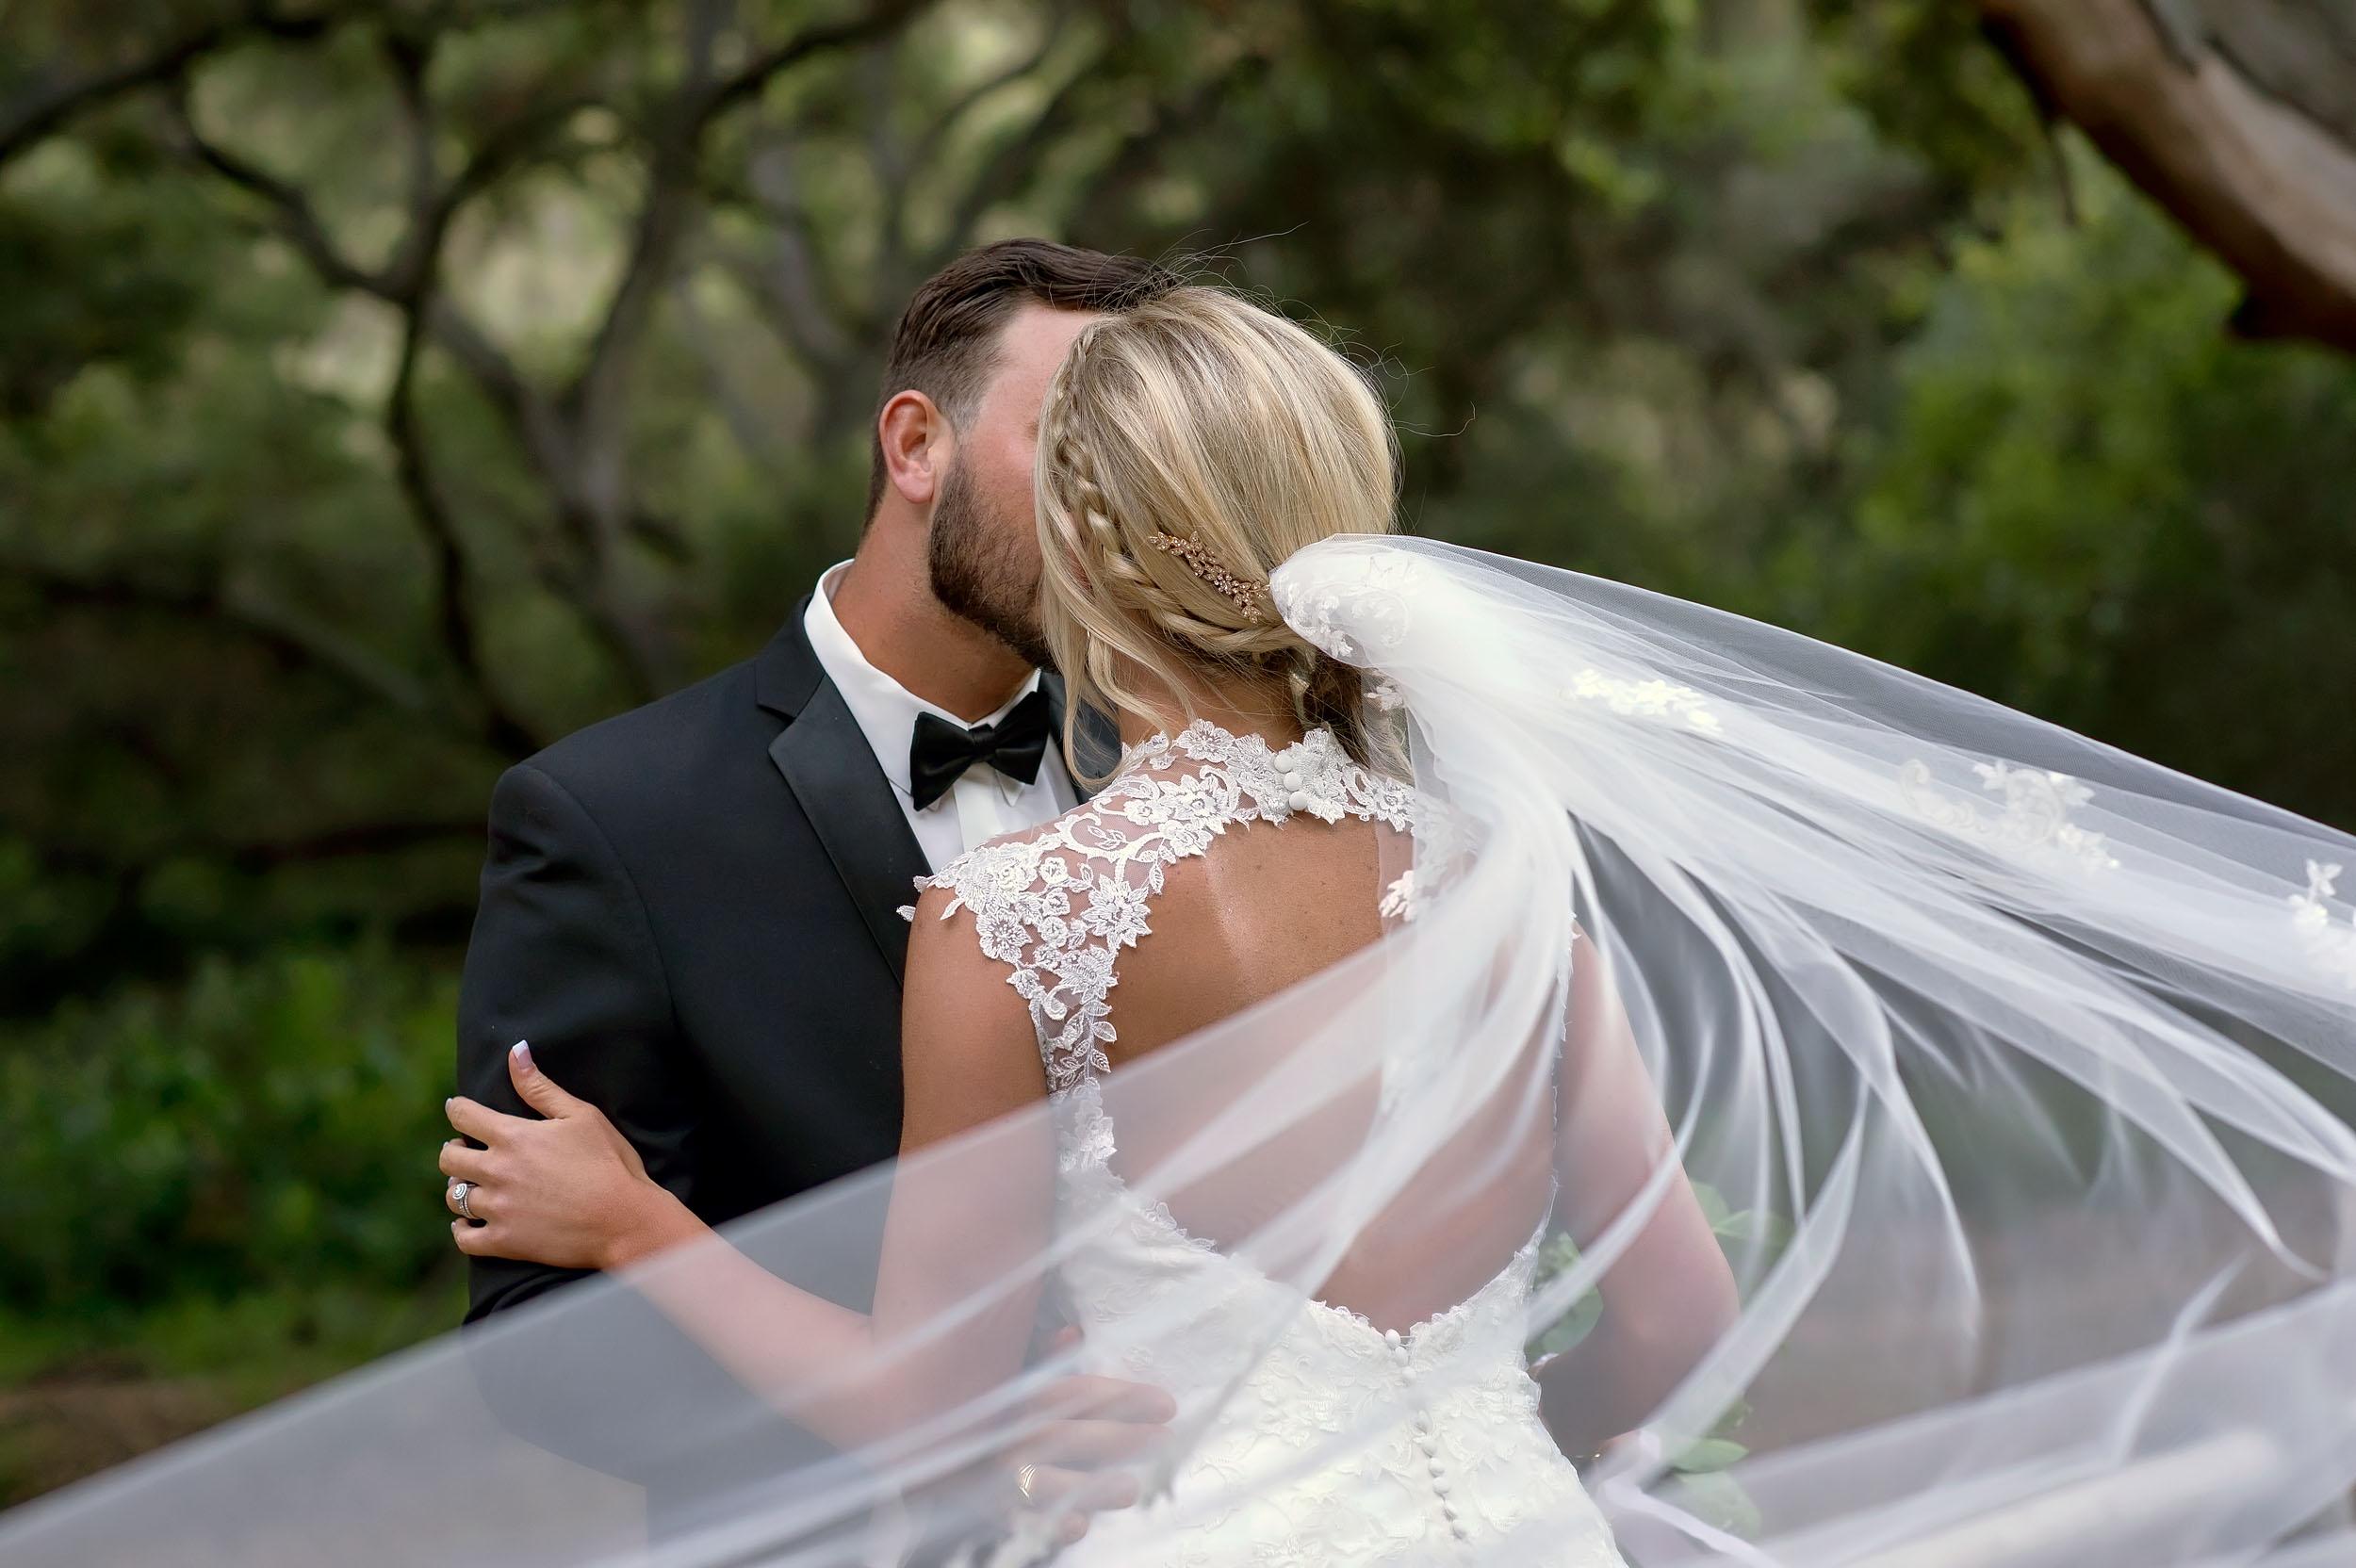 Bride and groom with flowing veil at Temecula Creek Inn in Temecula.